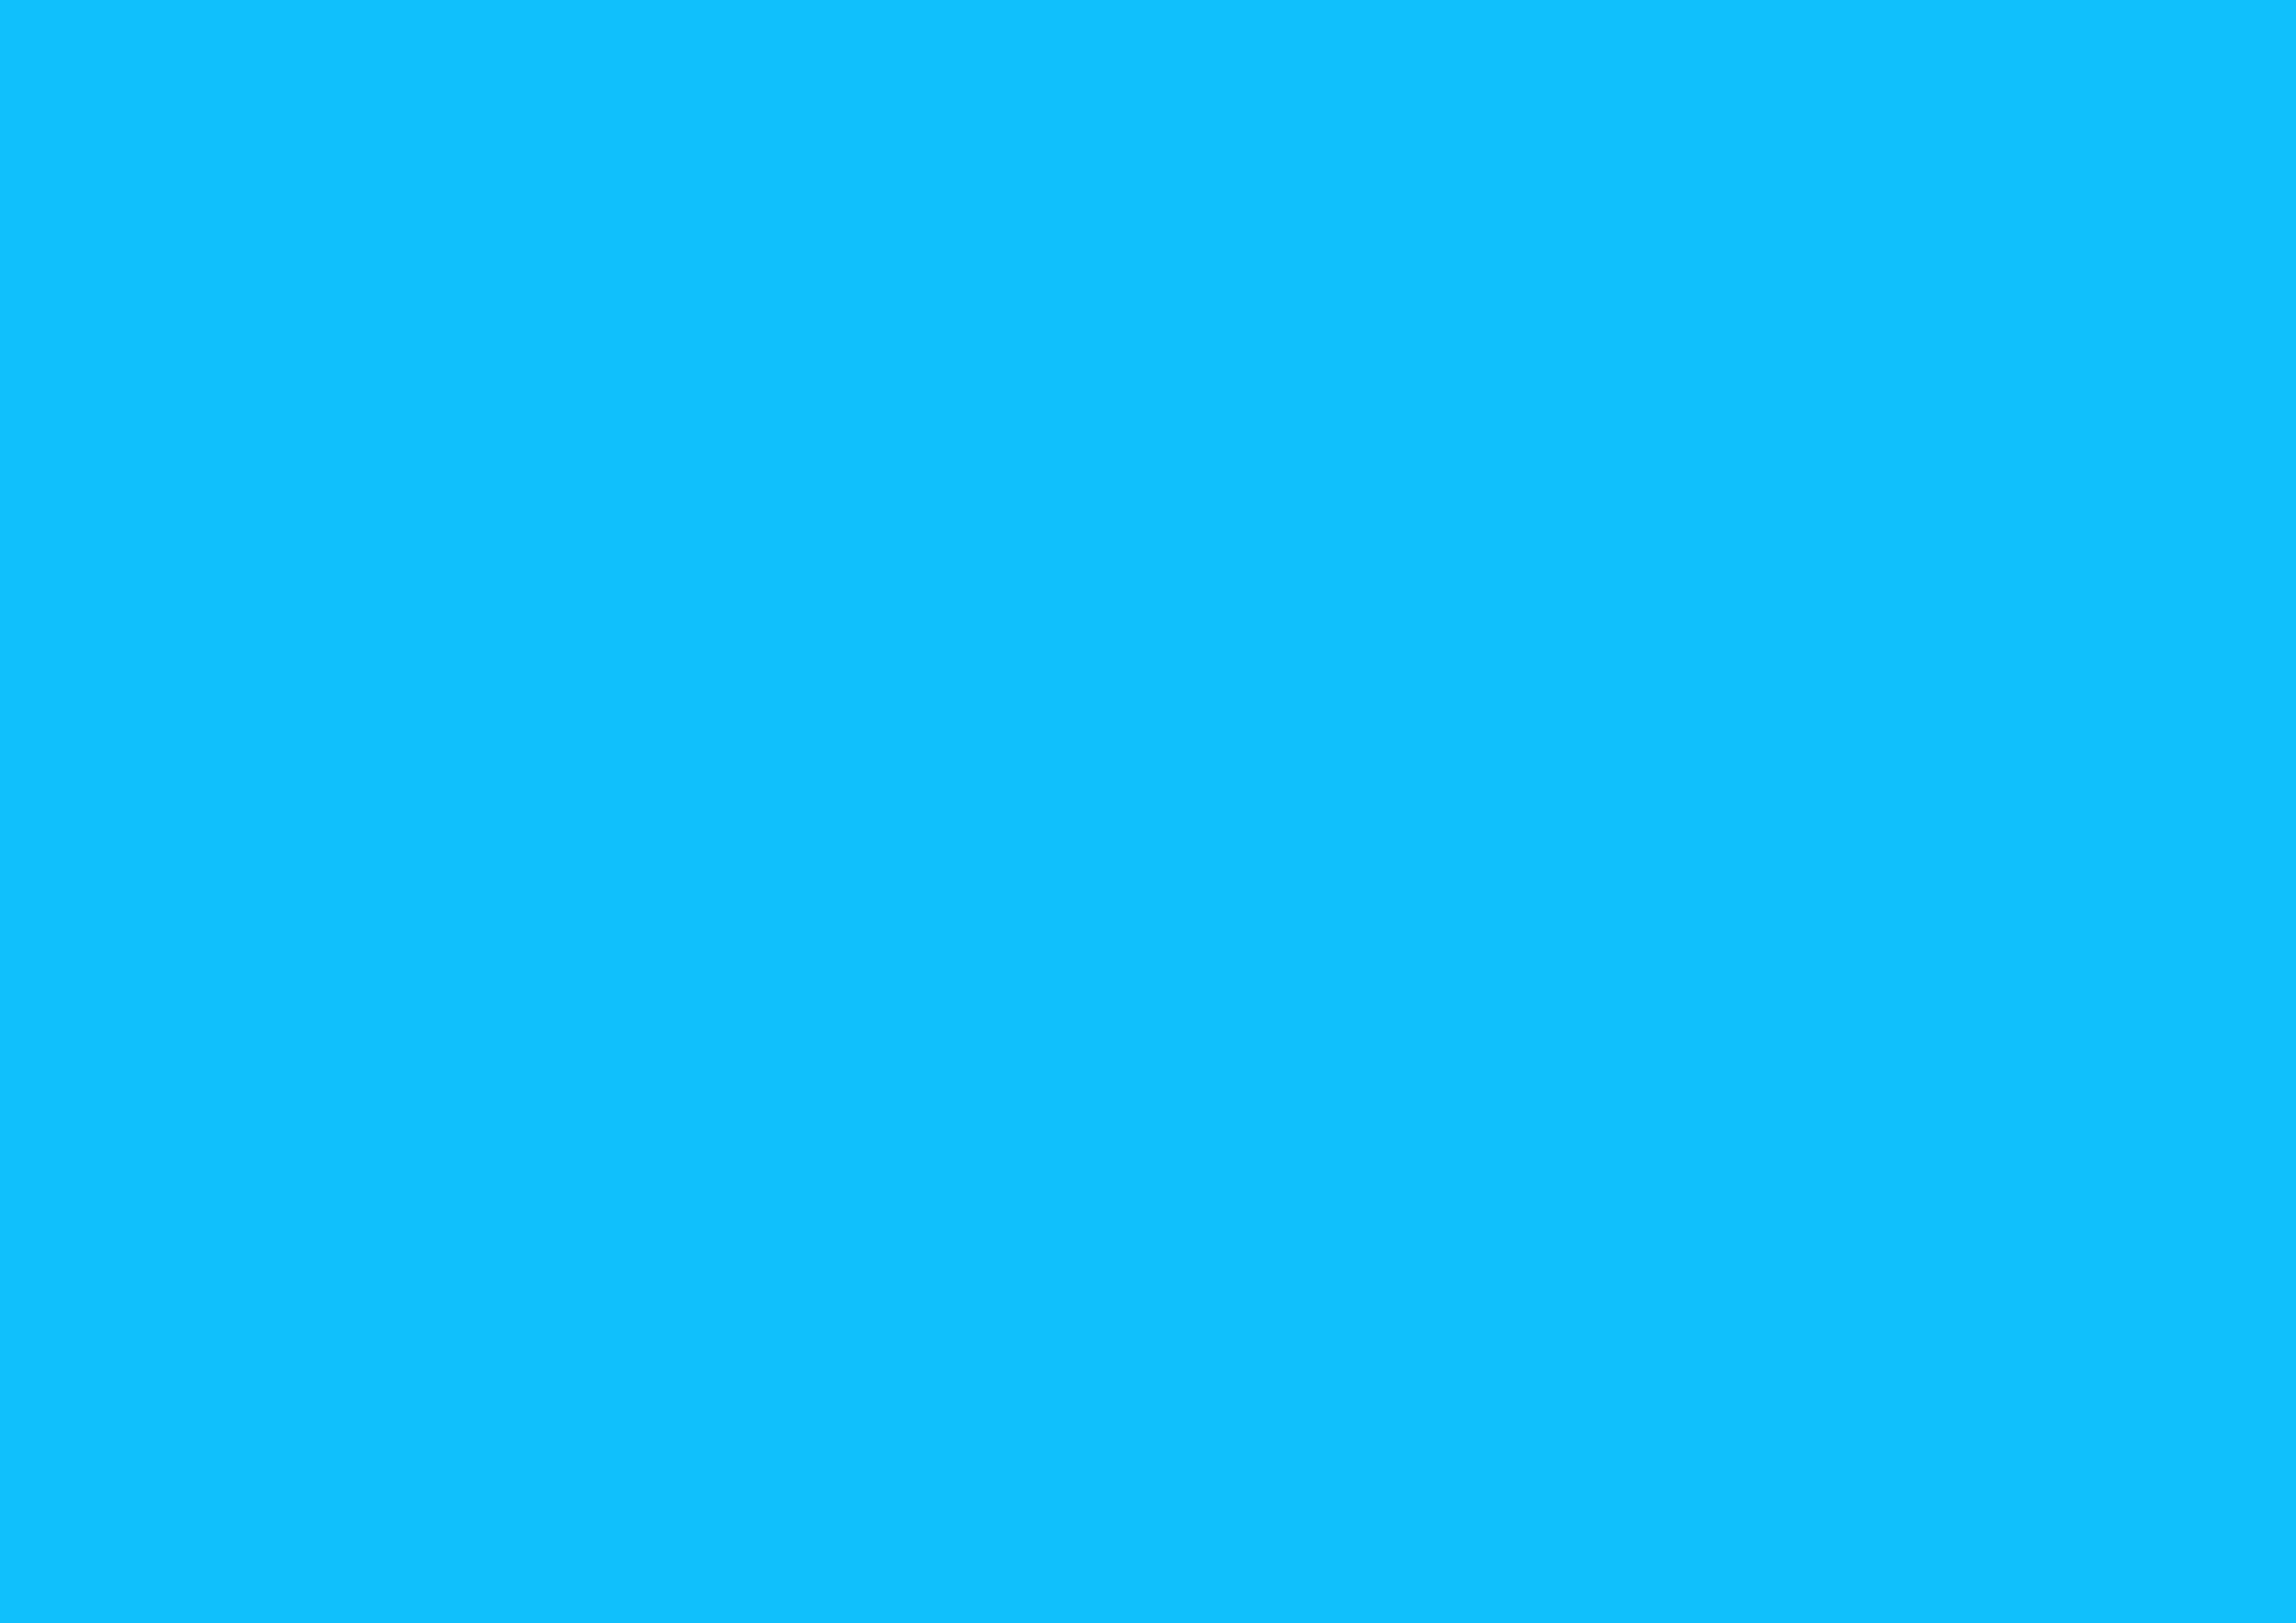 3508x2480 Spiro Disco Ball Solid Color Background